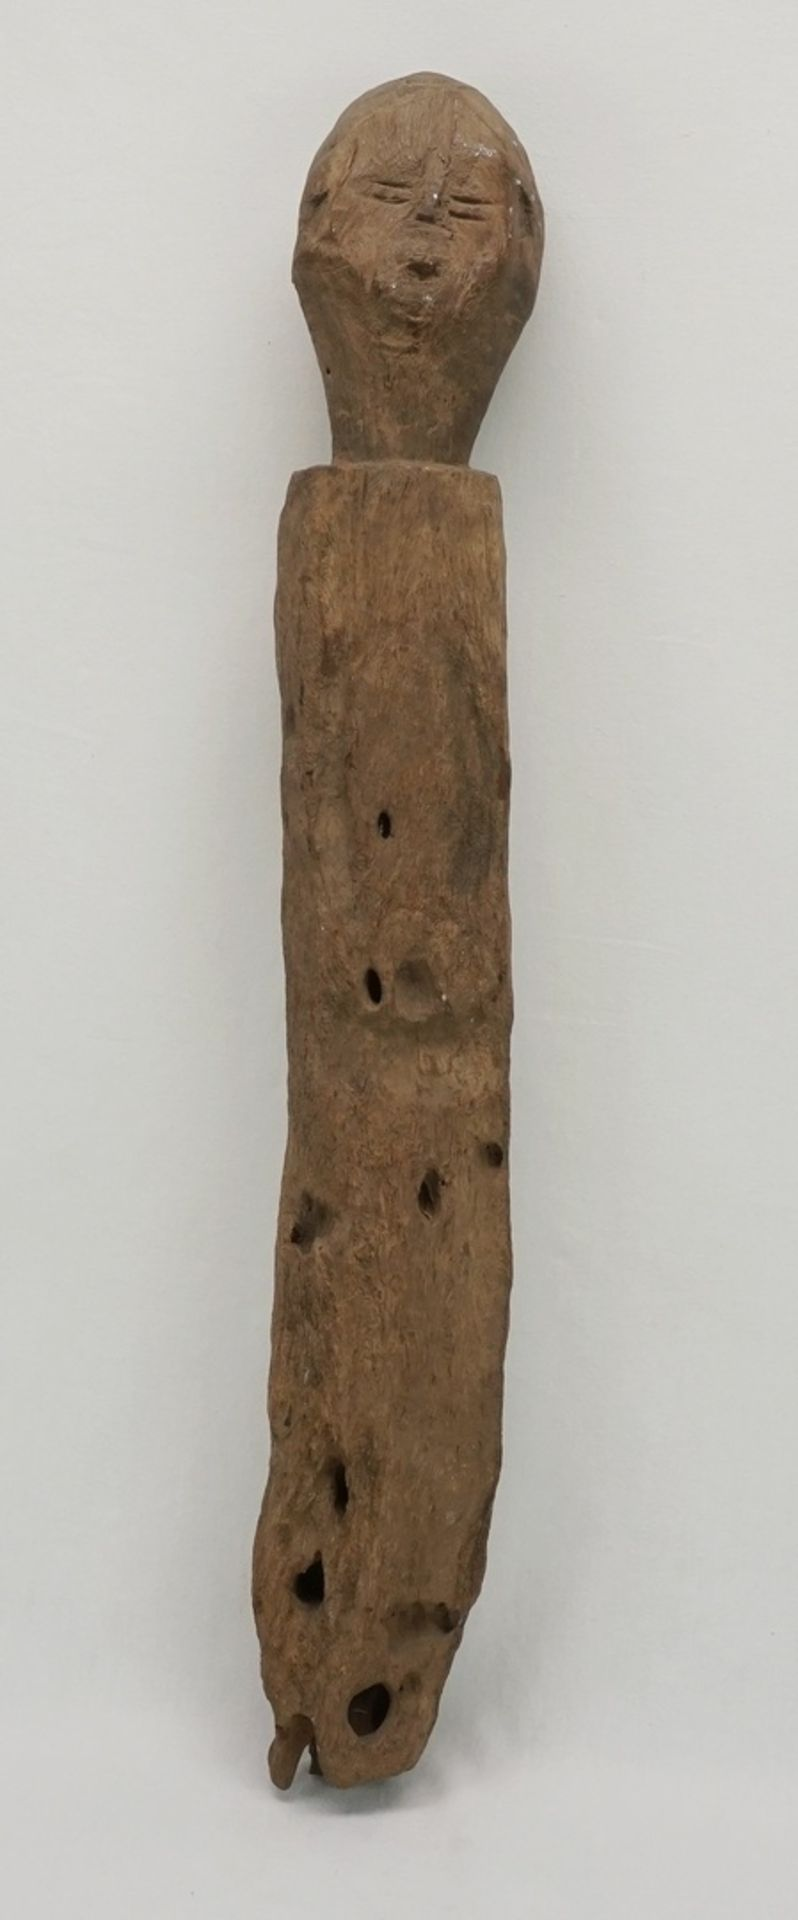 "Pfahlfigur ""bochio"", Benin, Fon, 1. Hälfte 20. Jh. - Bild 2 aus 2"